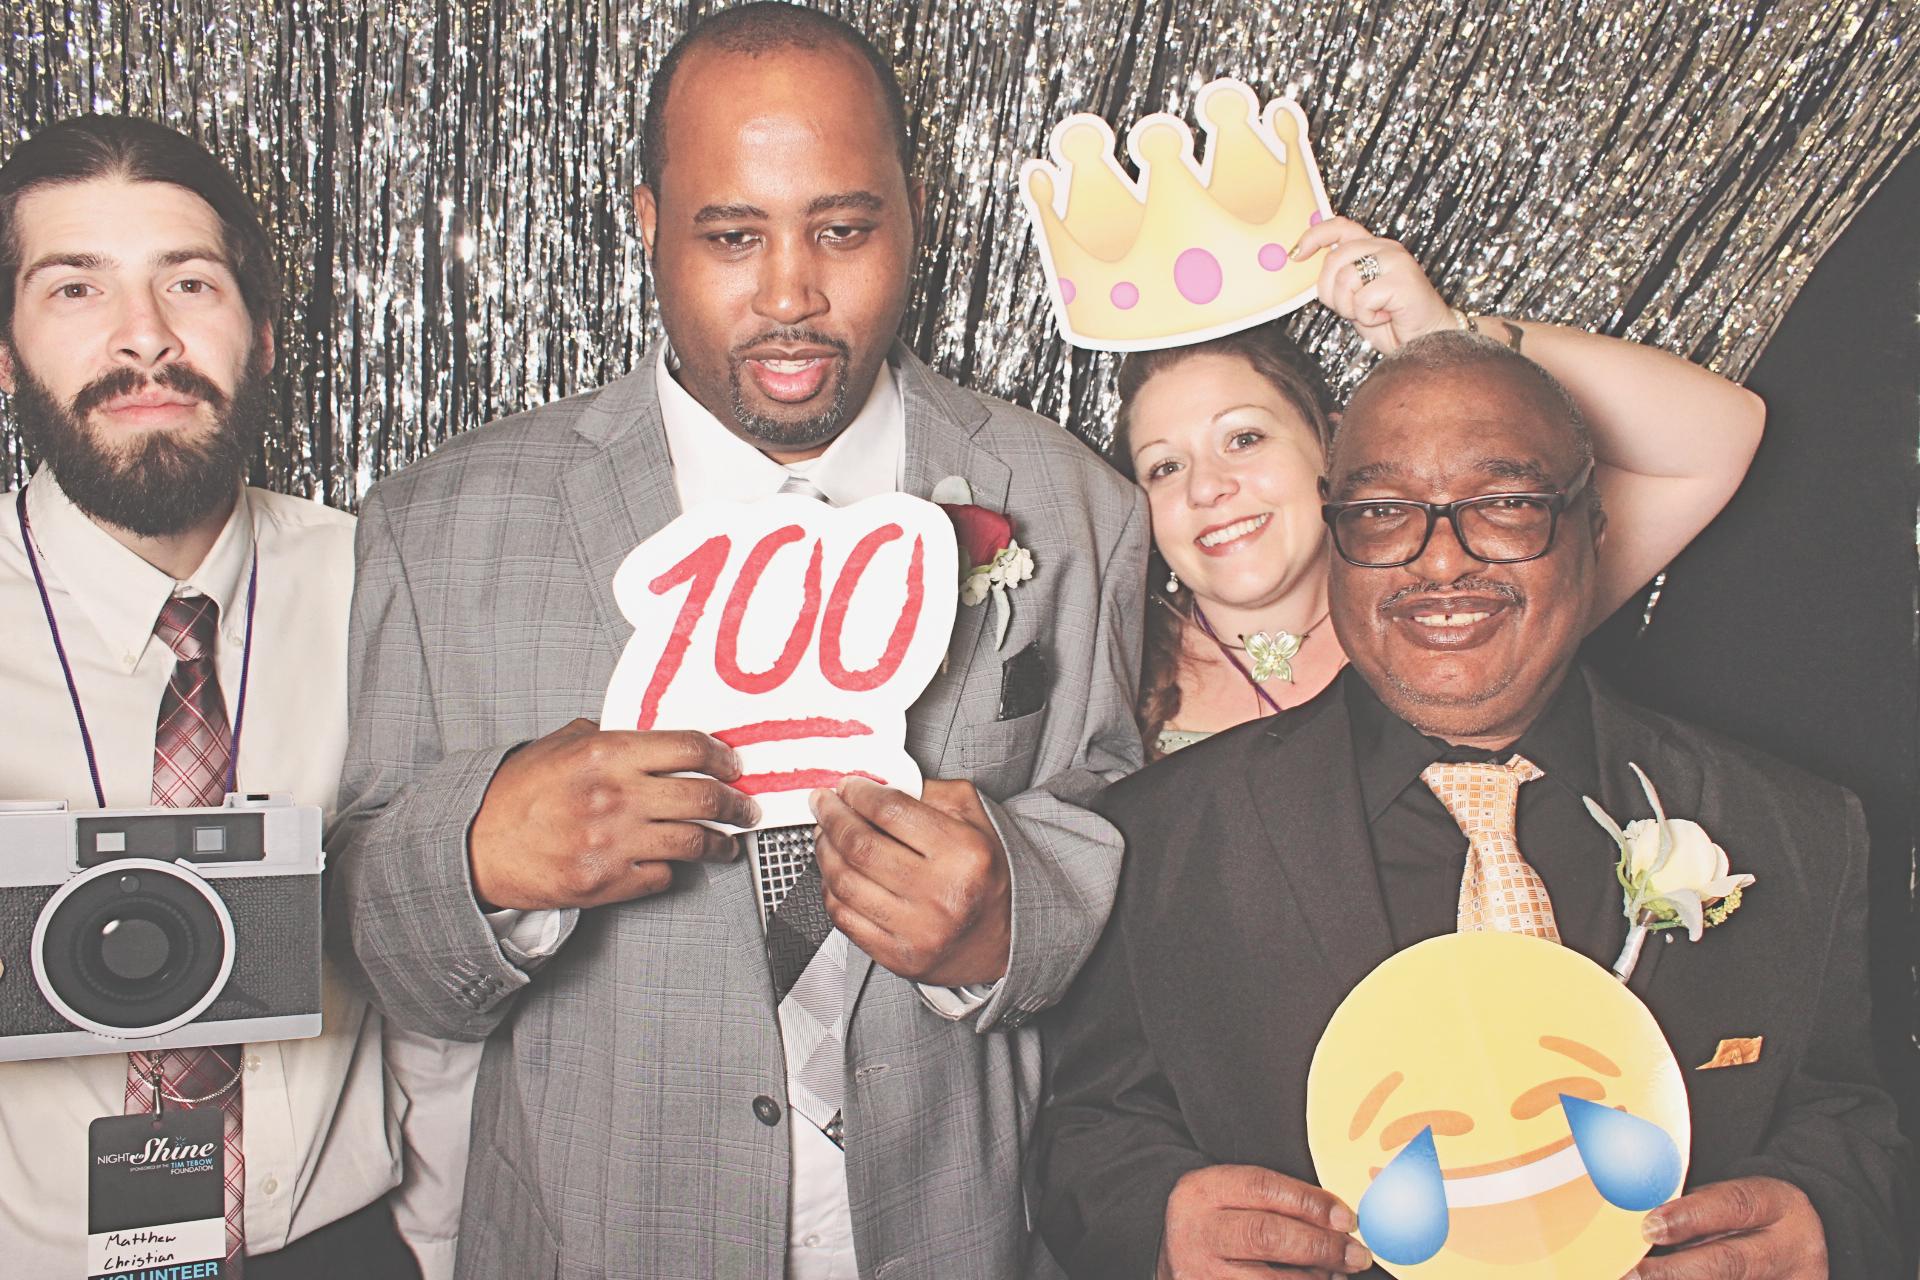 2-8-19 Atlanta Southcrest Church Photo Booth - Night to Shine Coweta 2019 - Robot Booth149.jpg